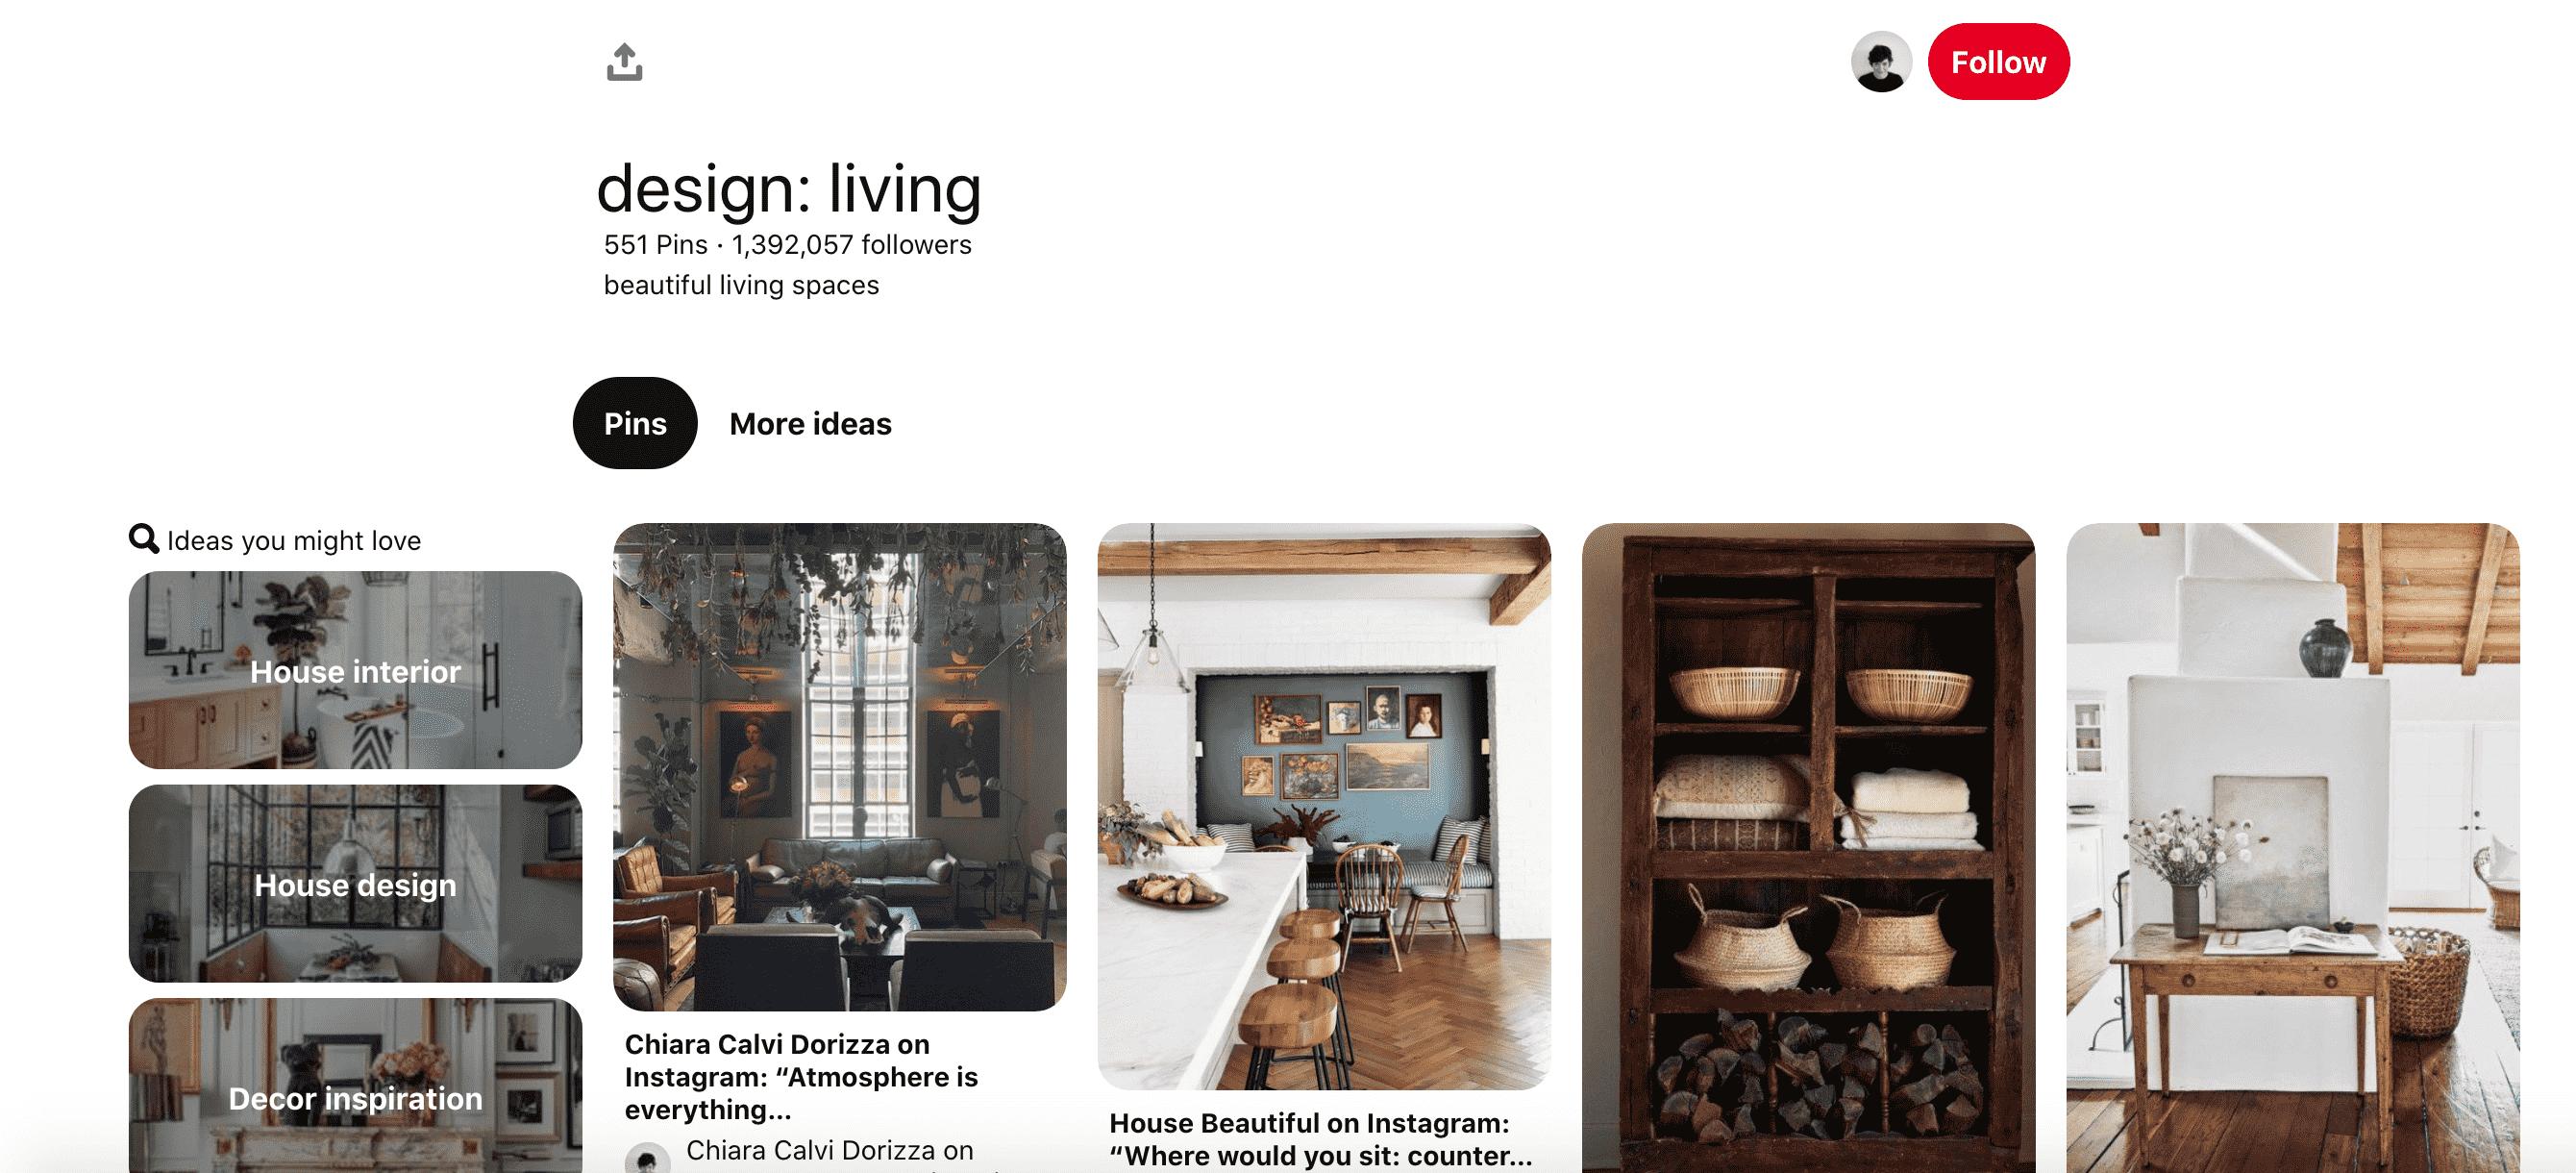 design- living board